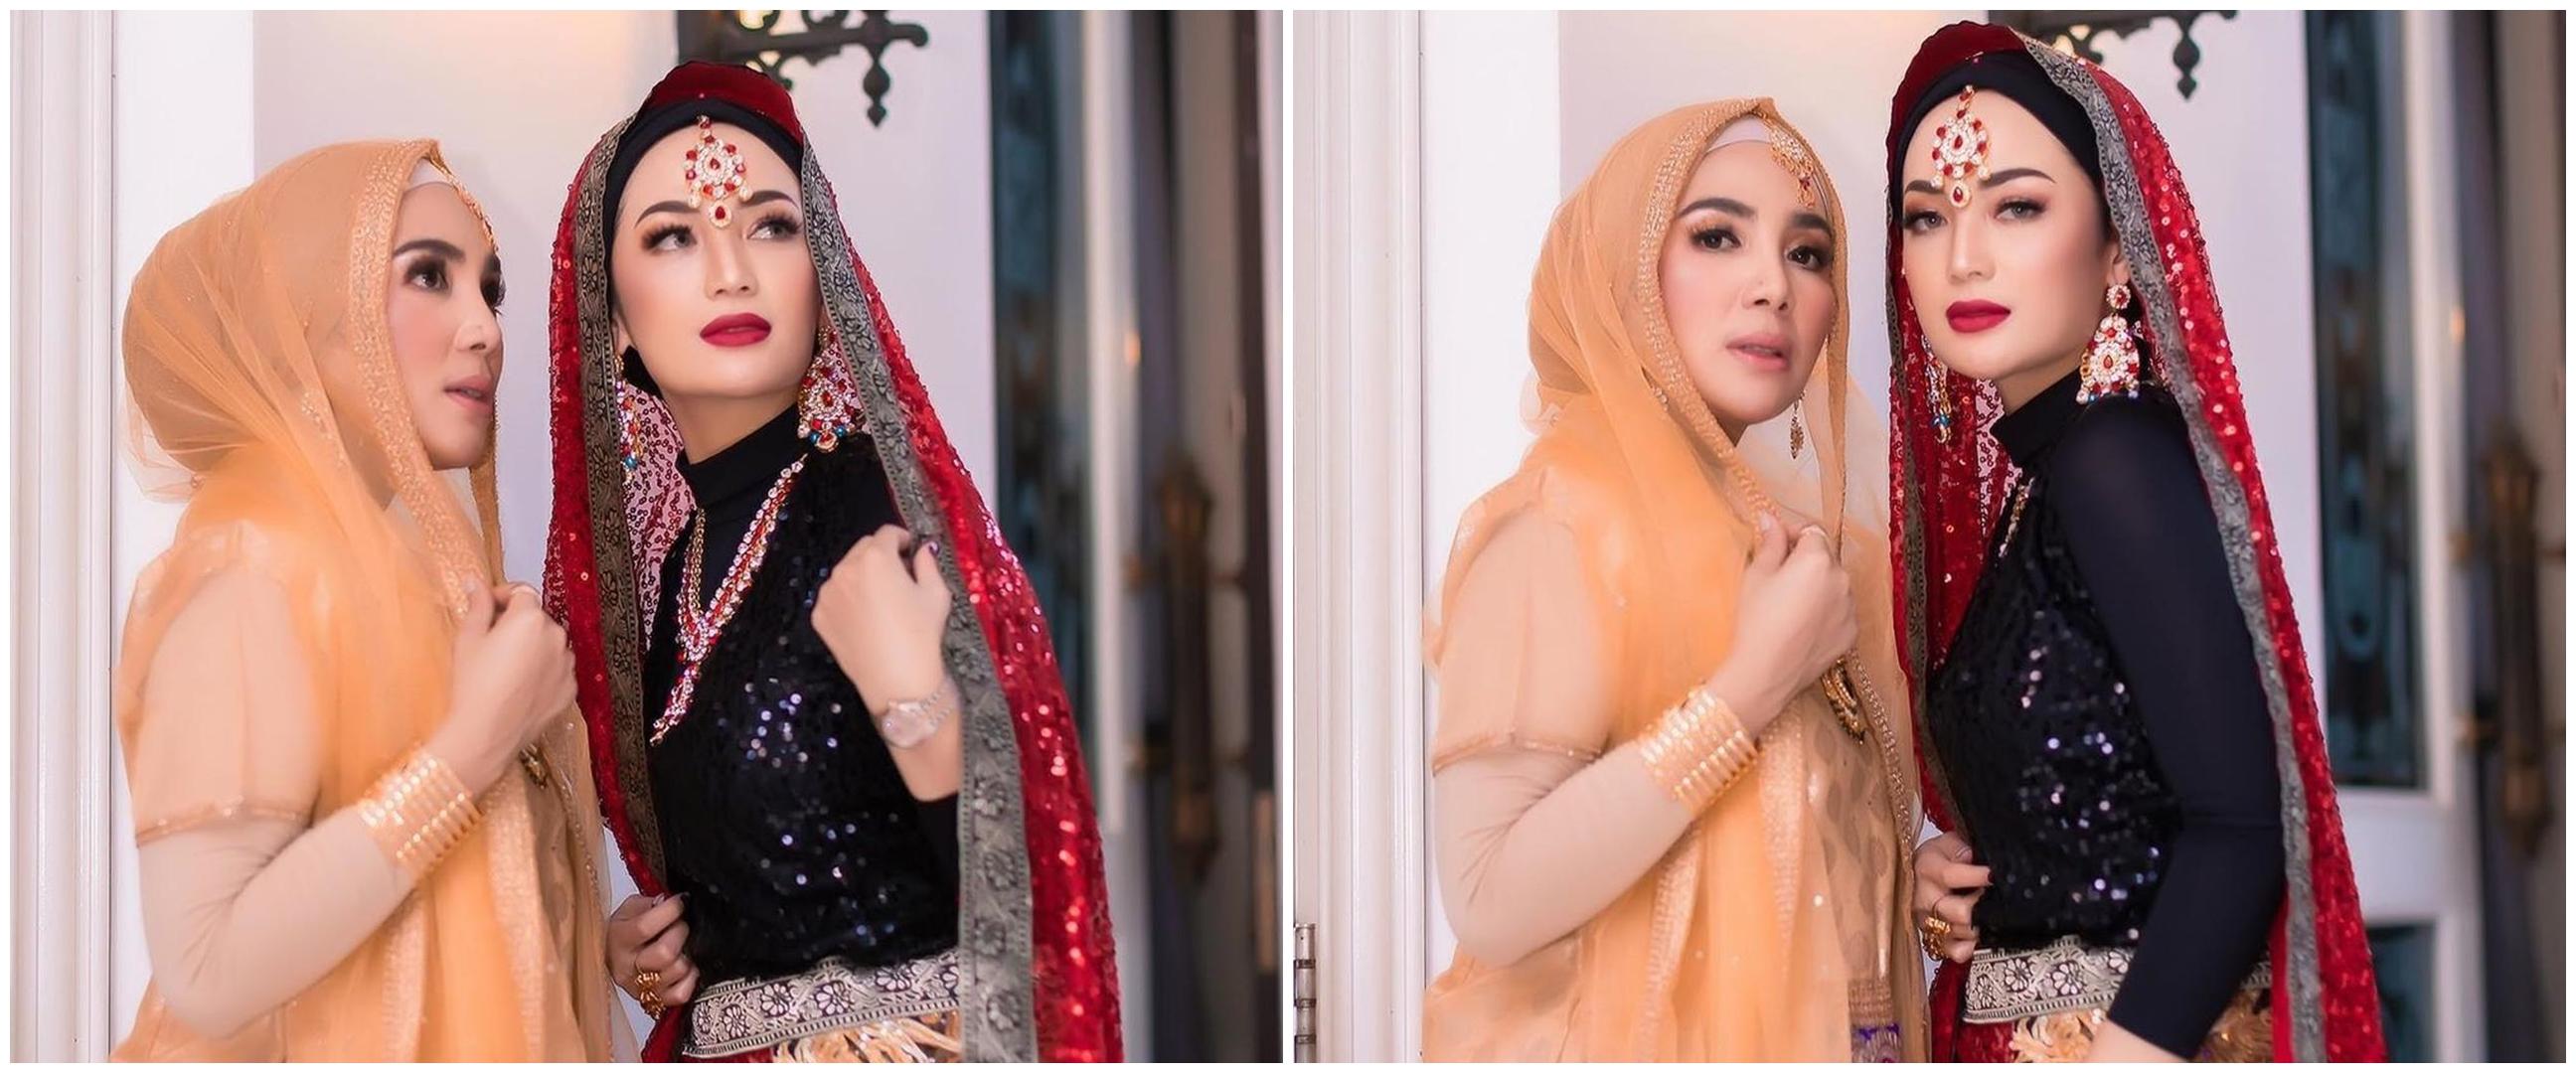 7 Gaya Imel Putri saat arisan bergaya ala artis Bollywood, memesona